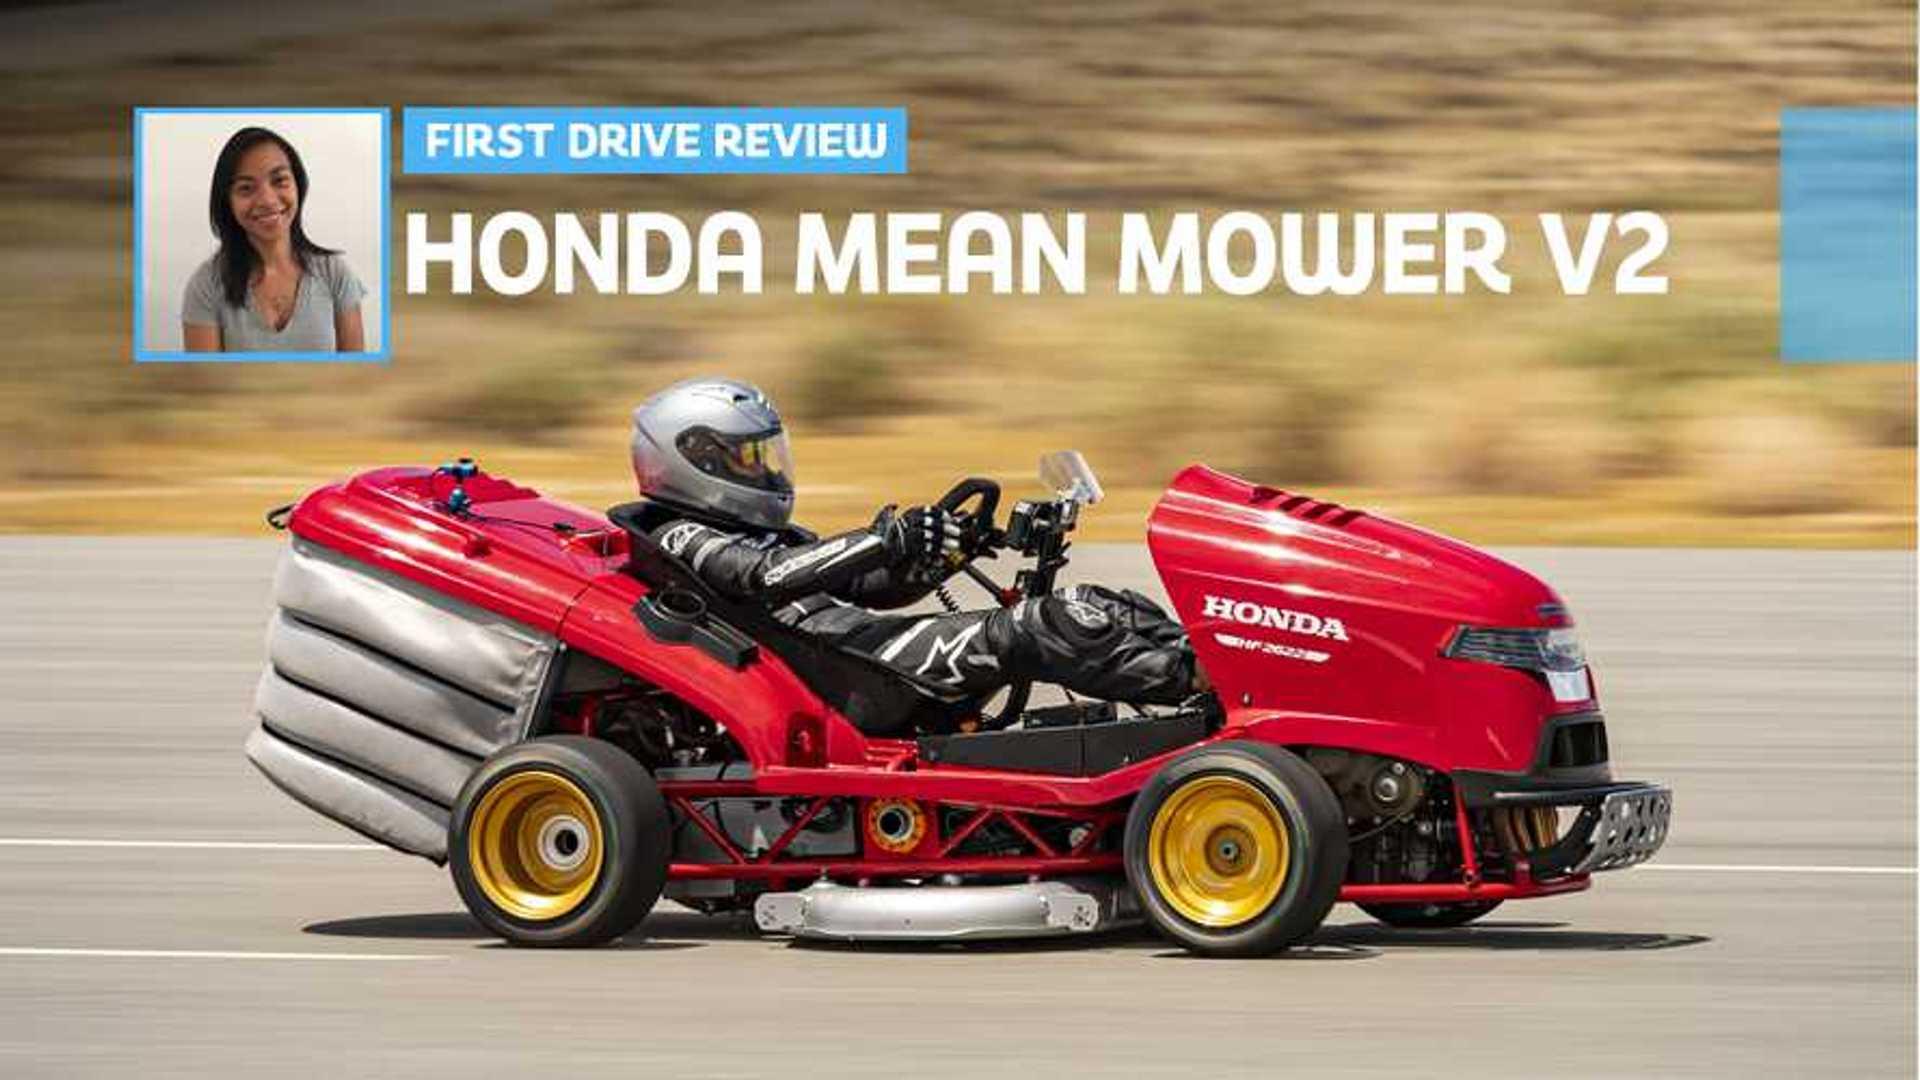 Honda Mean Mower V2 First Drive Hauling Grass